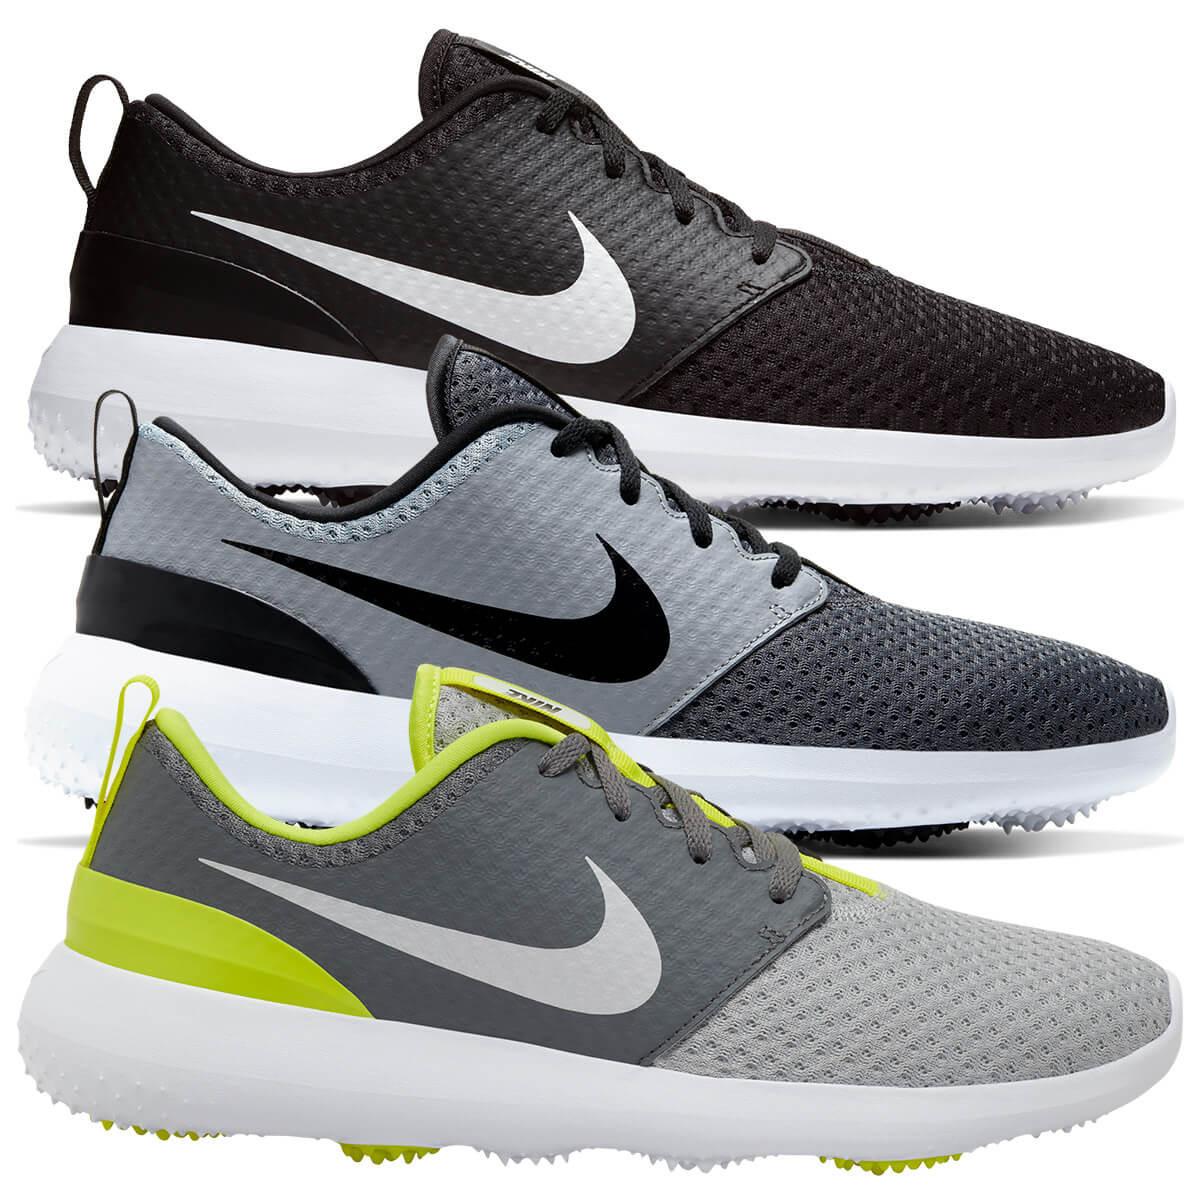 Nike Mens 2020 Nike Roshe G Spikeless Mesh Breathable Cushioned Golf Shoes